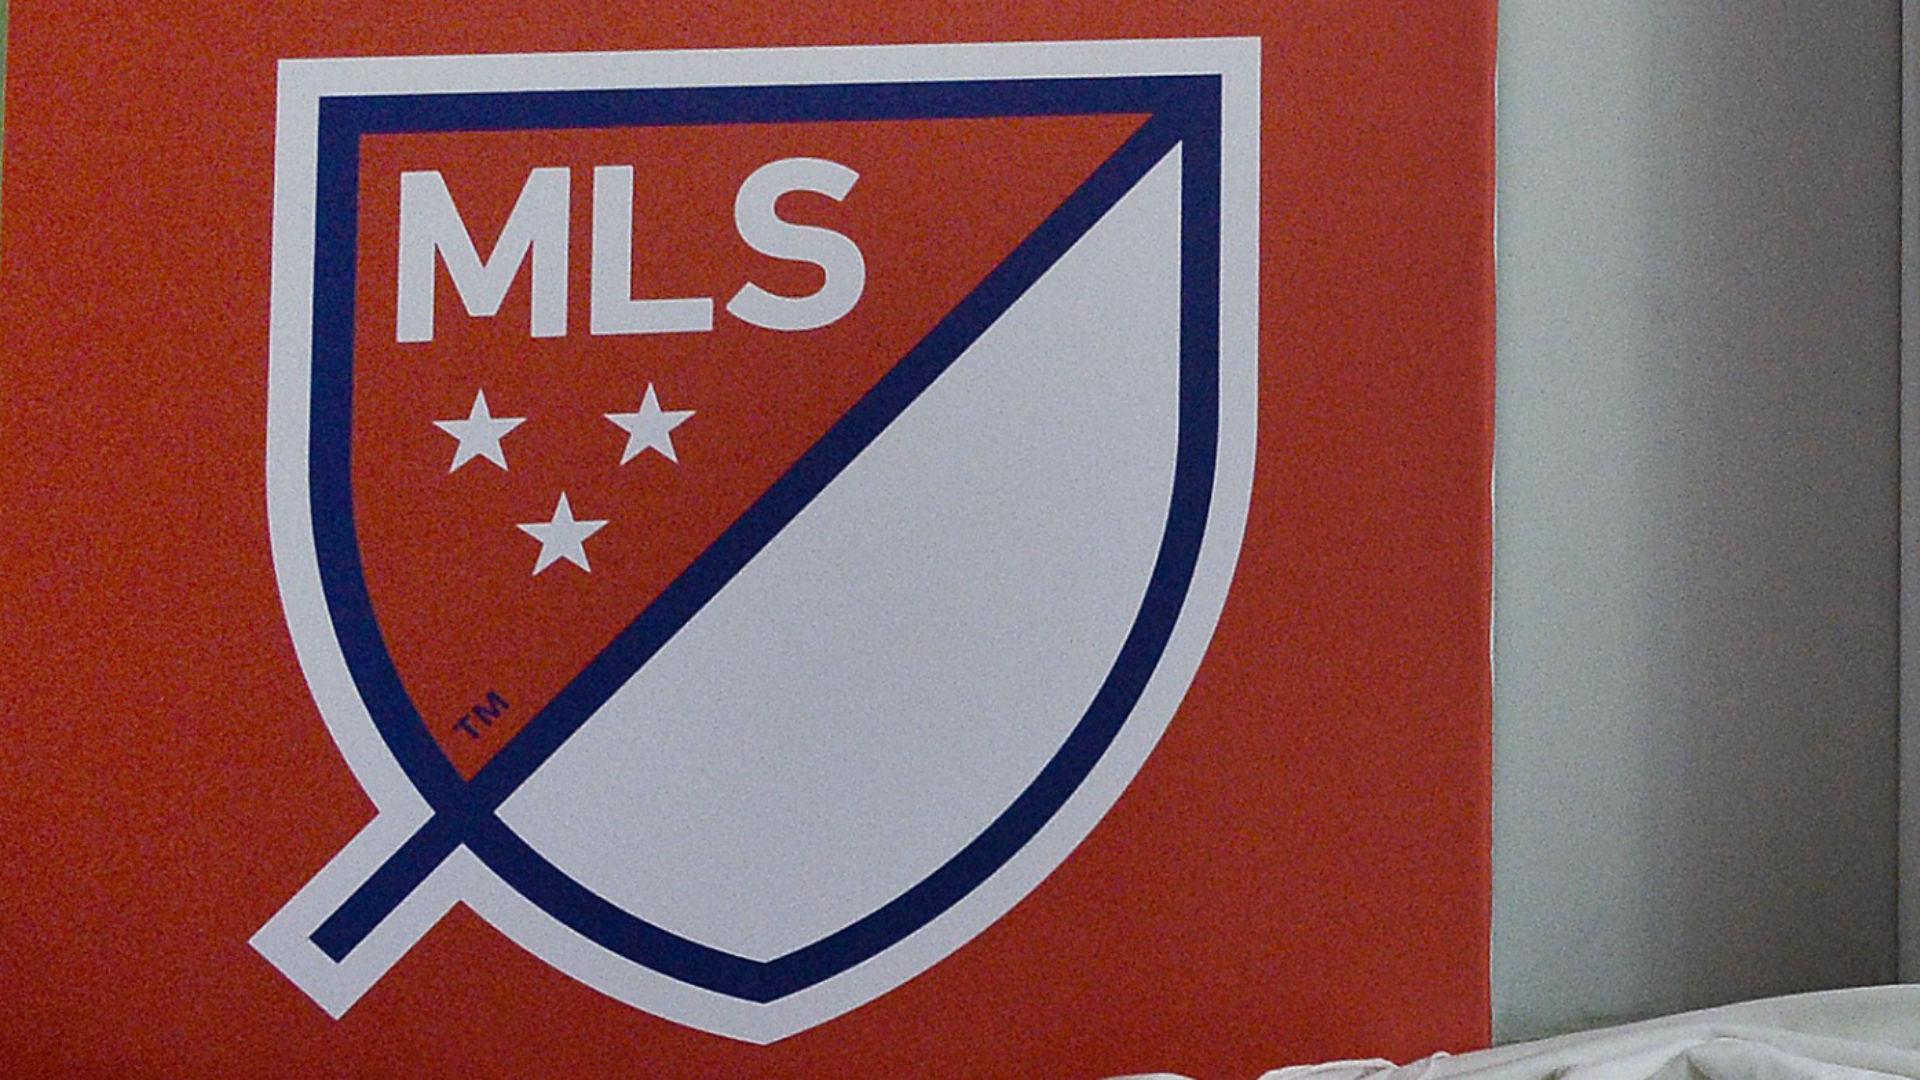 MLS-logo-030415-Getty-FTR.jpg